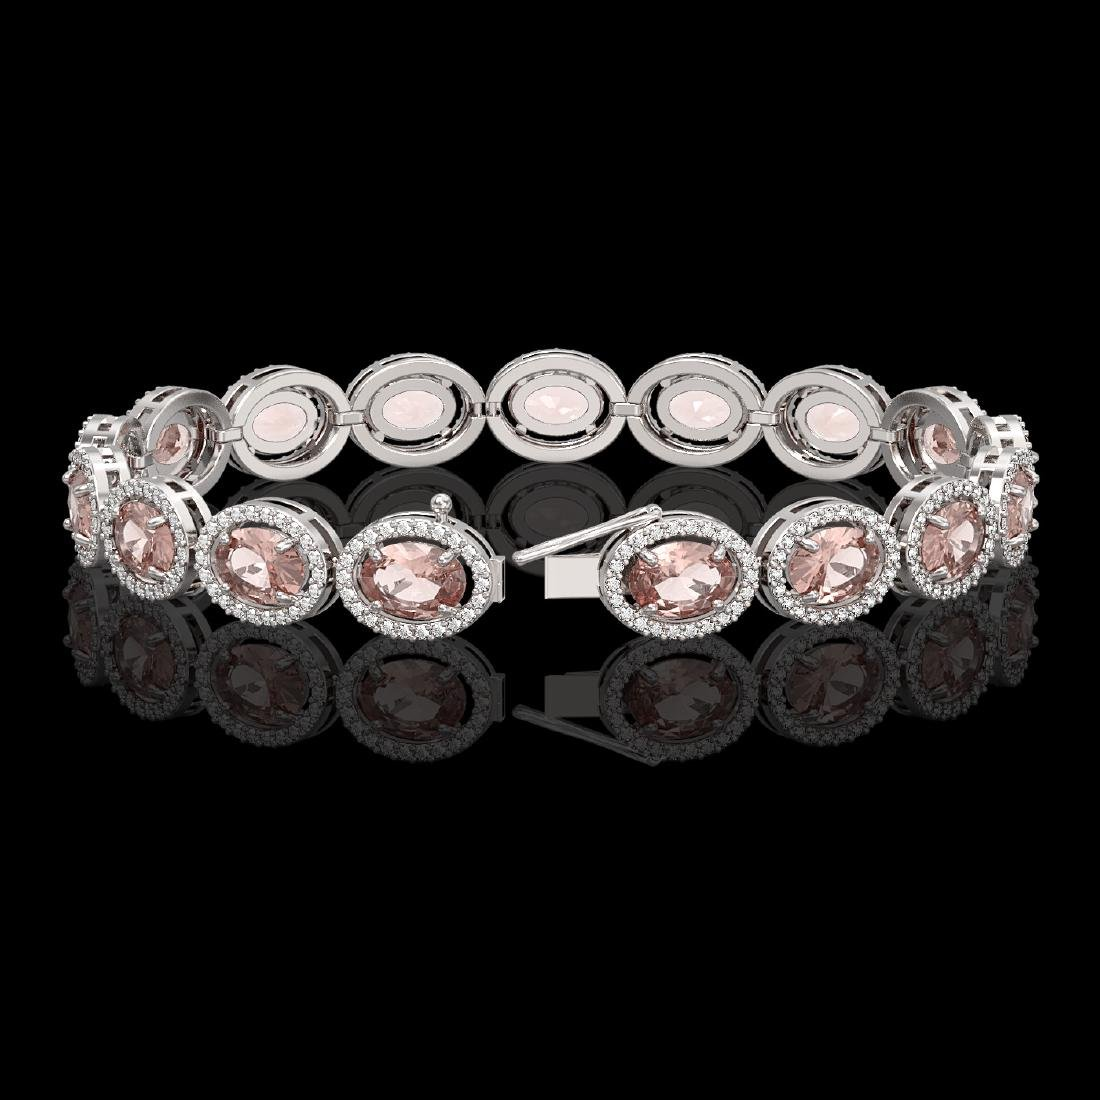 20.18 CTW Morganite & Diamond Halo Bracelet 10K White - 2